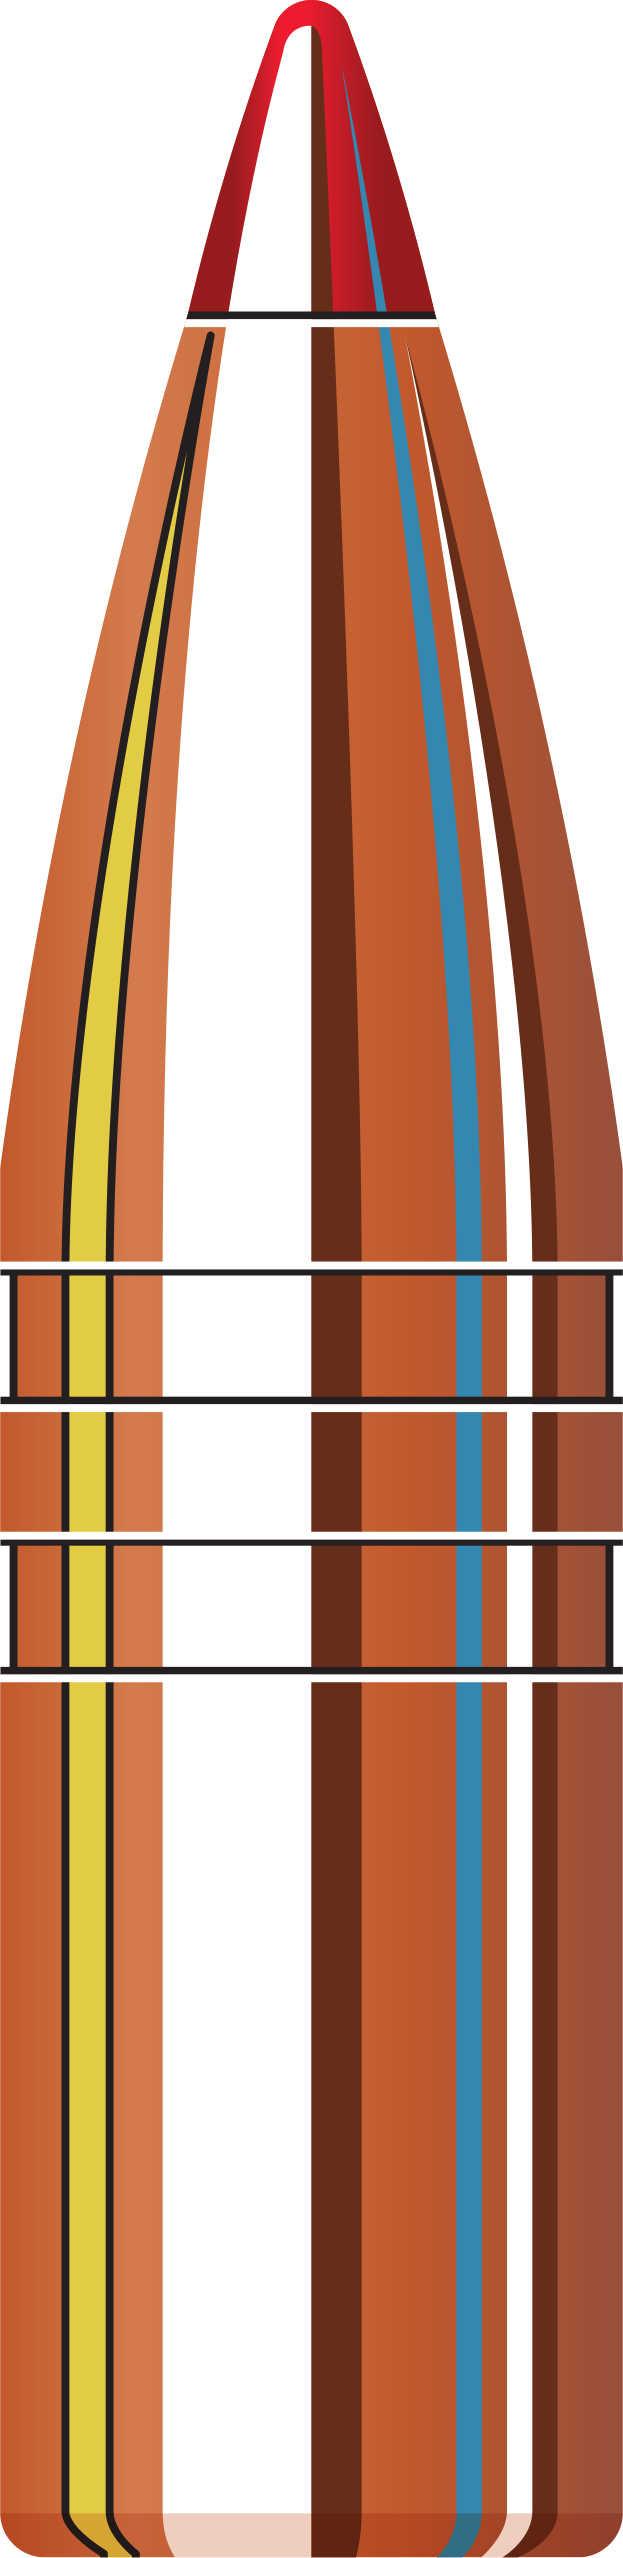 "Hornady 270 Caliber Bullets .277"" 110 Grains GMX (Per 50) Md: 27190"